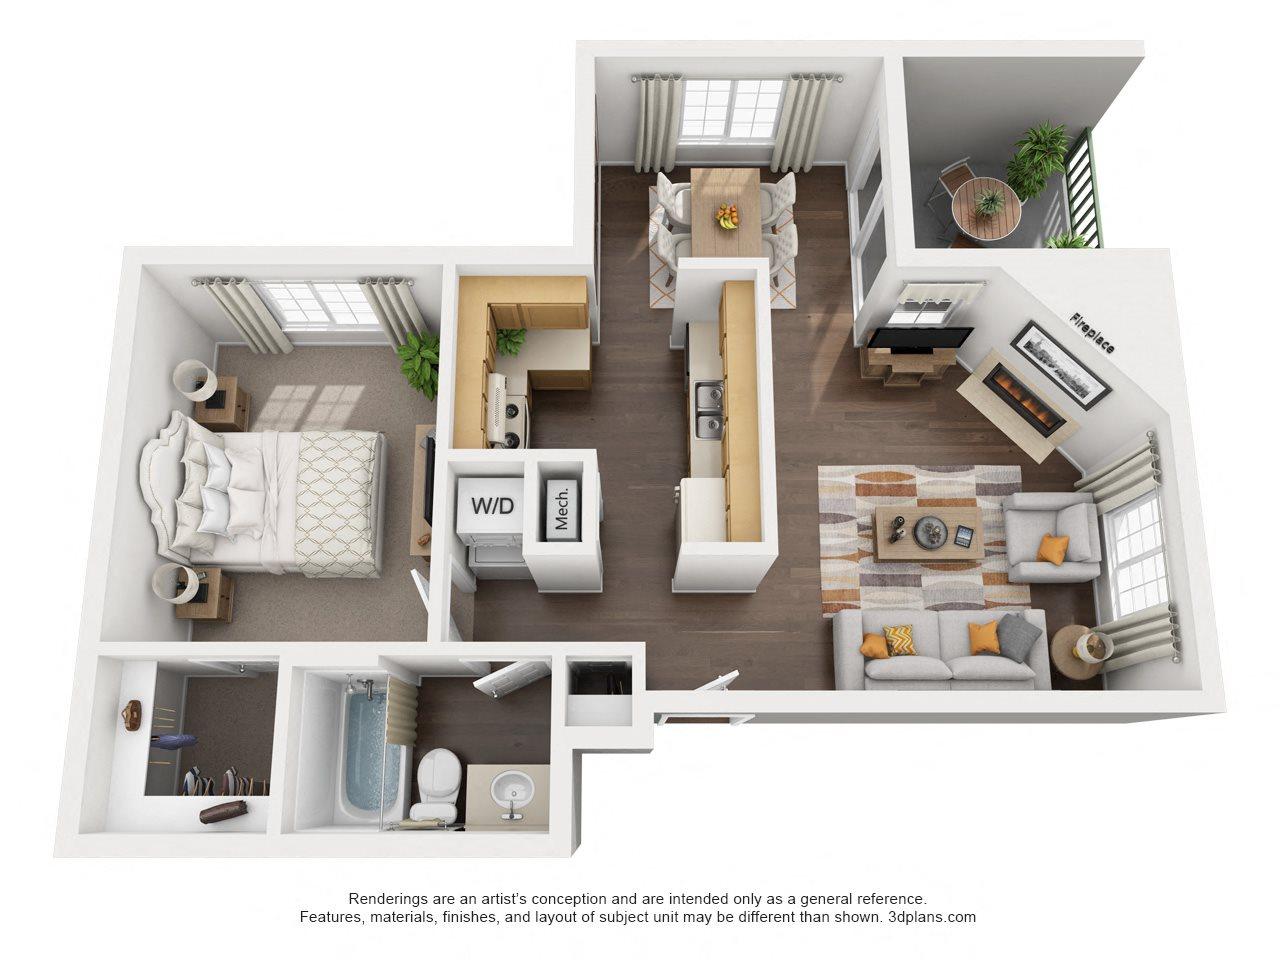 1 Bedroom, 1 Bath, Downstairs Floor Plan 1